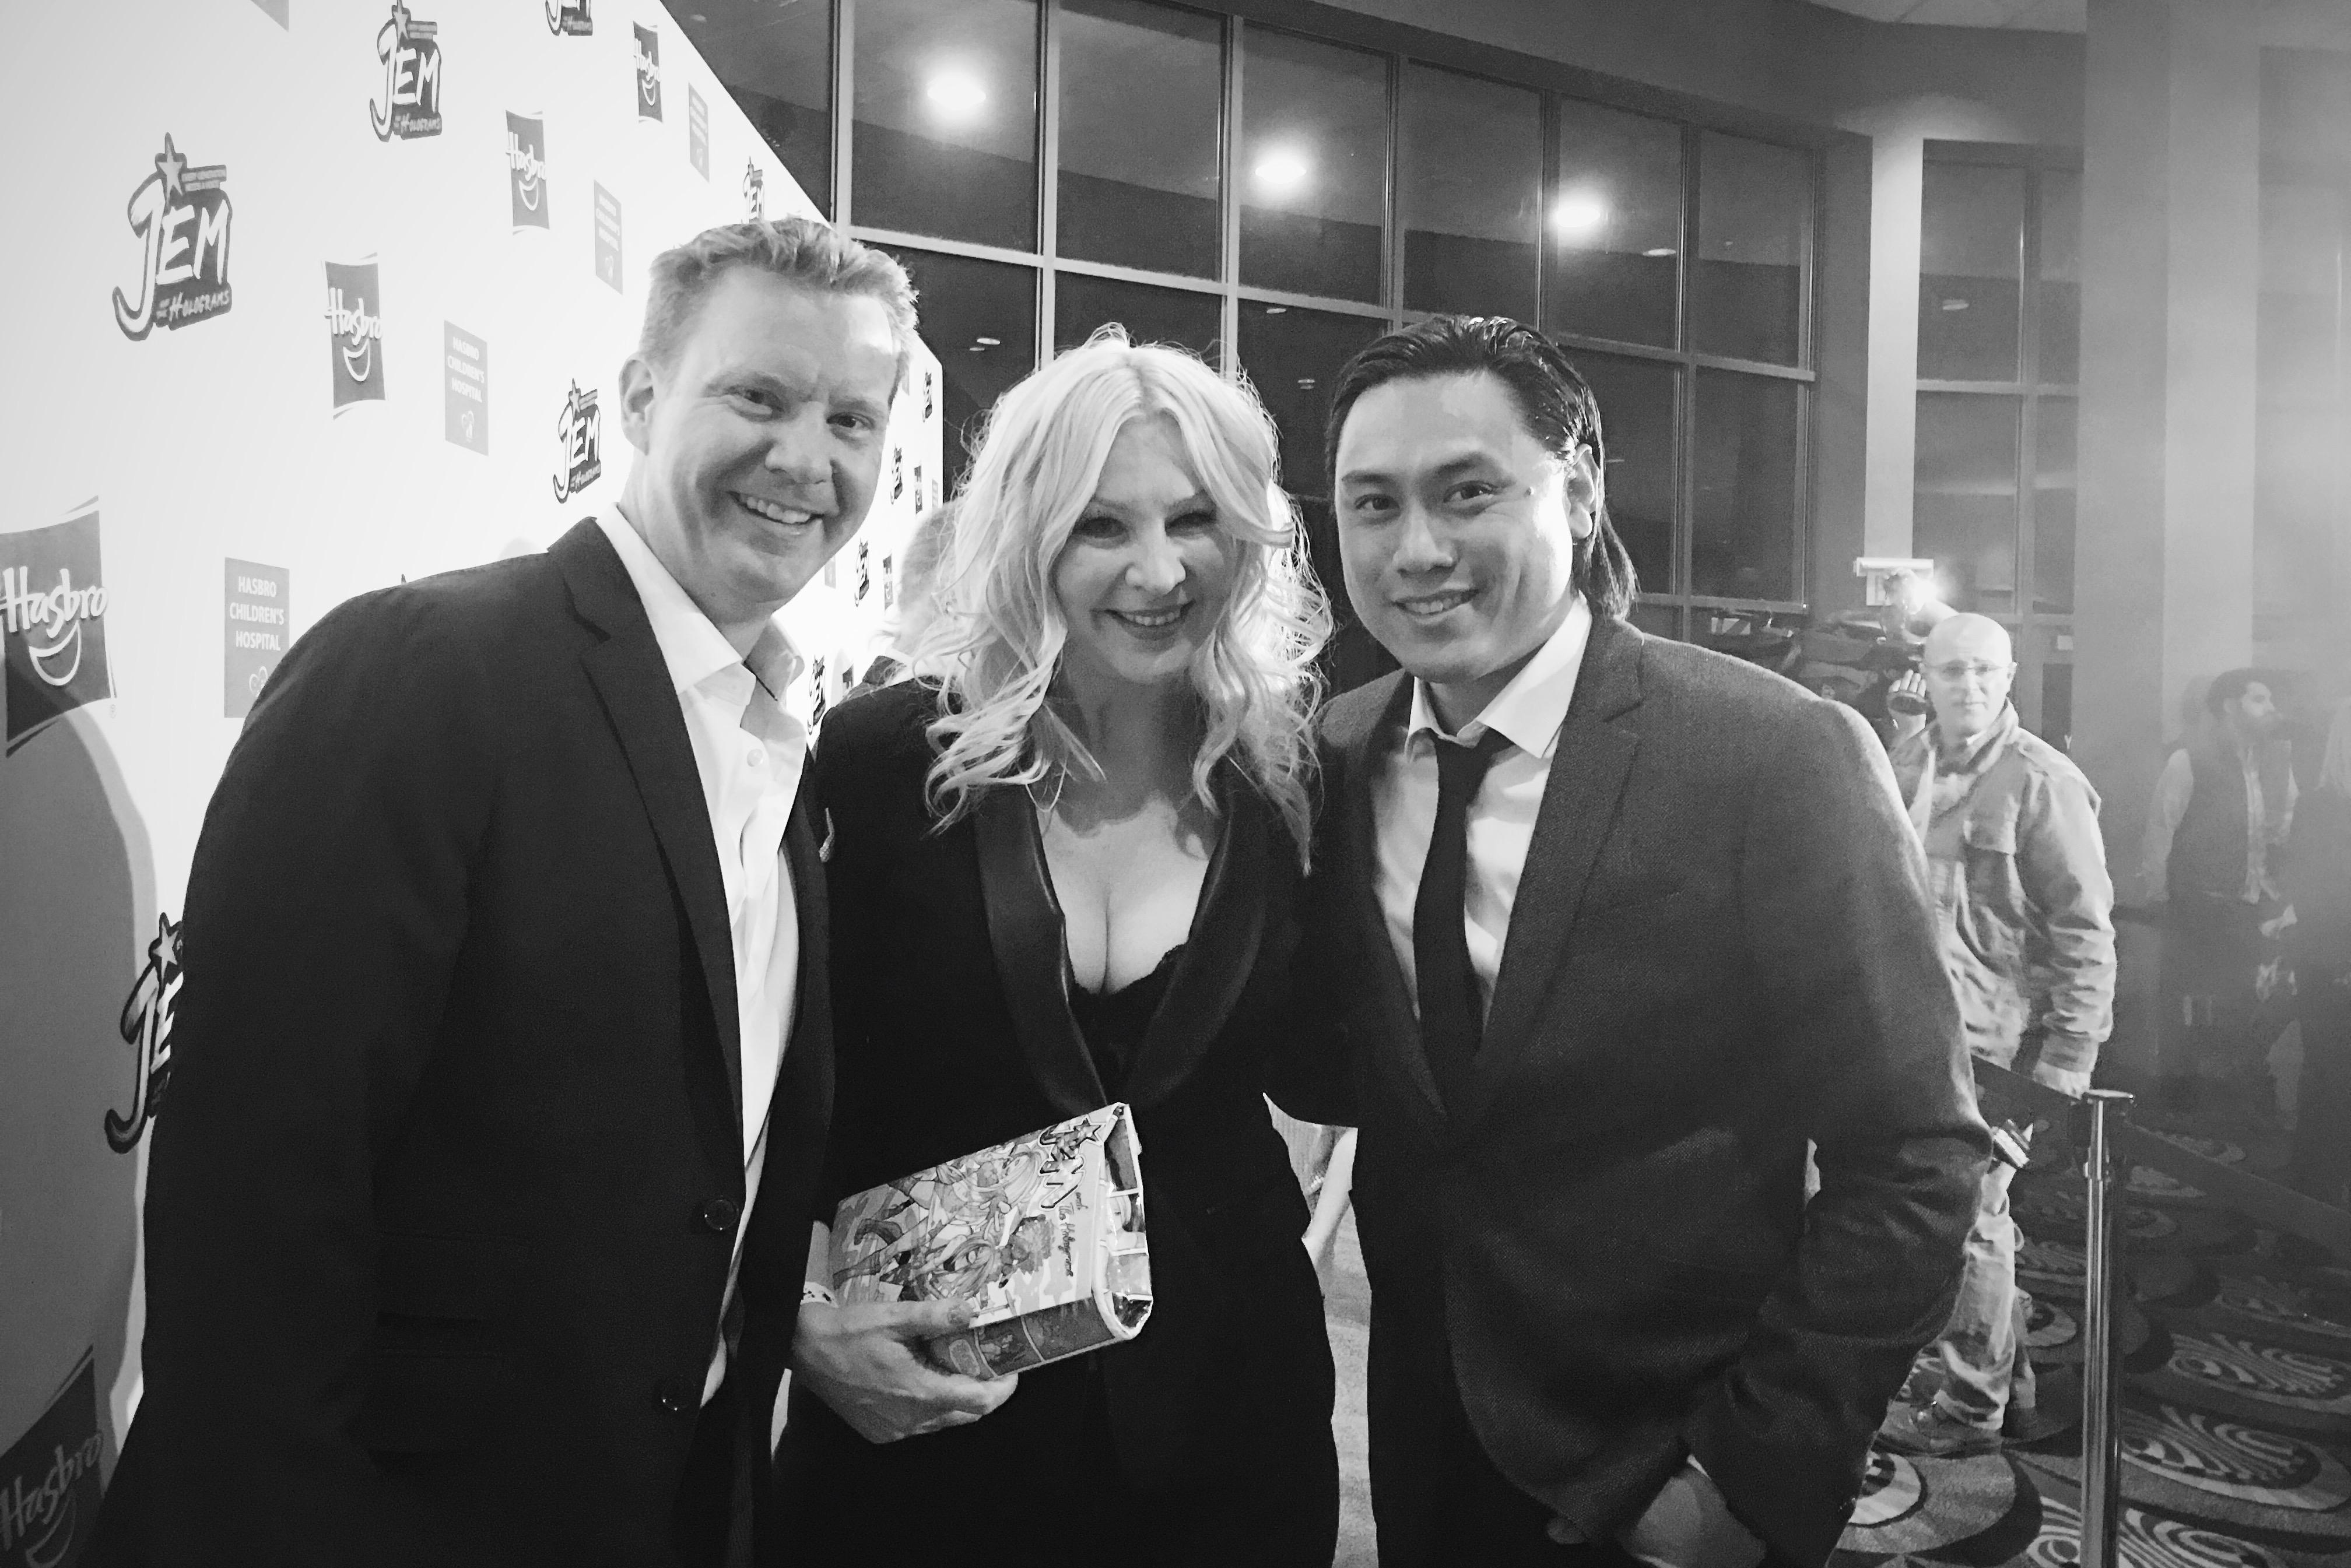 Jon M. Chu, Samantha Newark, and Ryan Landels in Jem and the Holograms (2015)